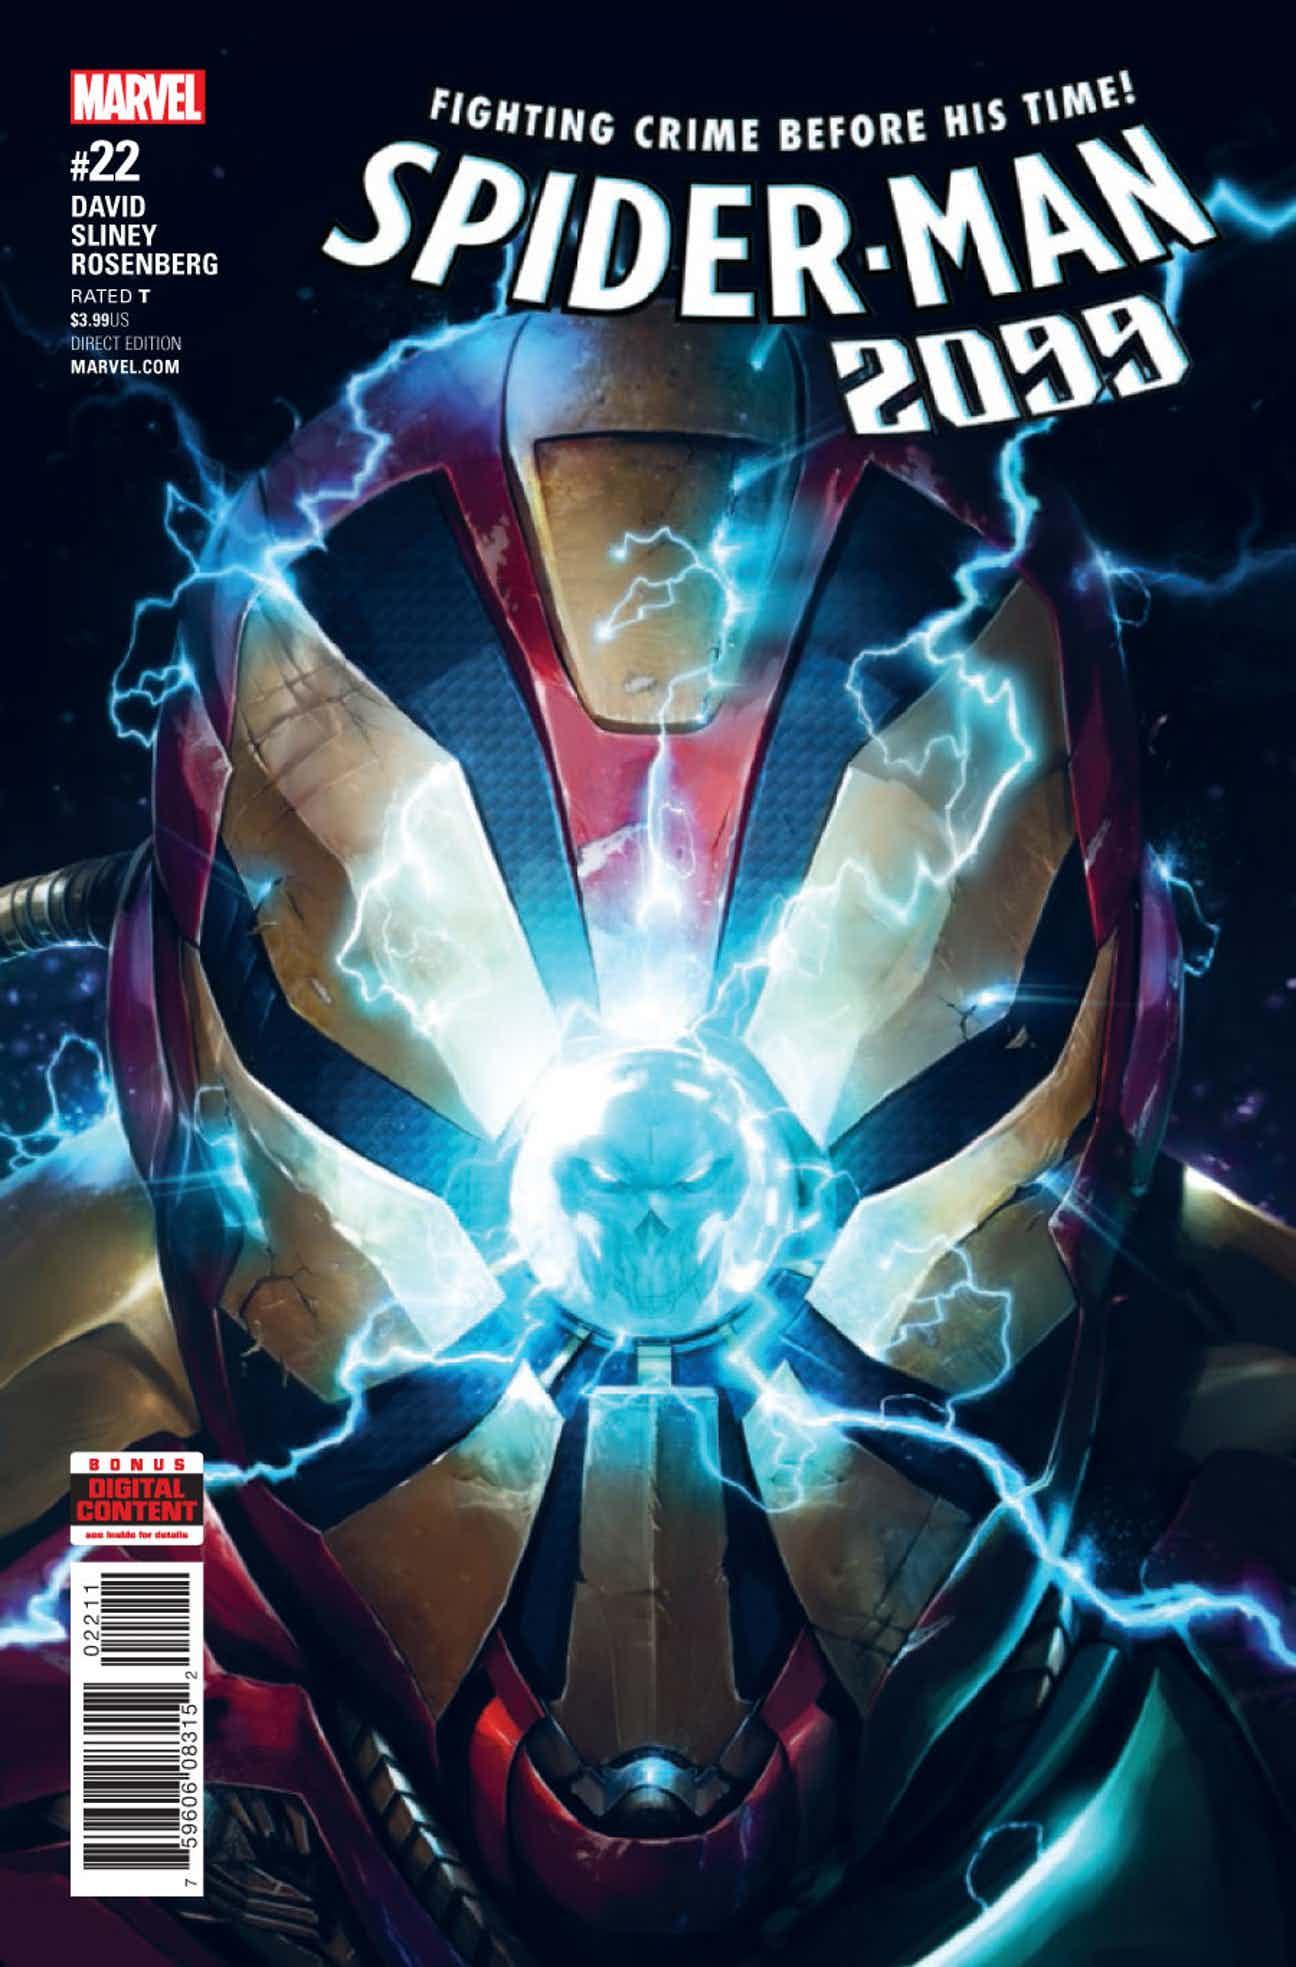 Spider-Man 2099 Vol 3 22 | Marvel Database | FANDOM powered